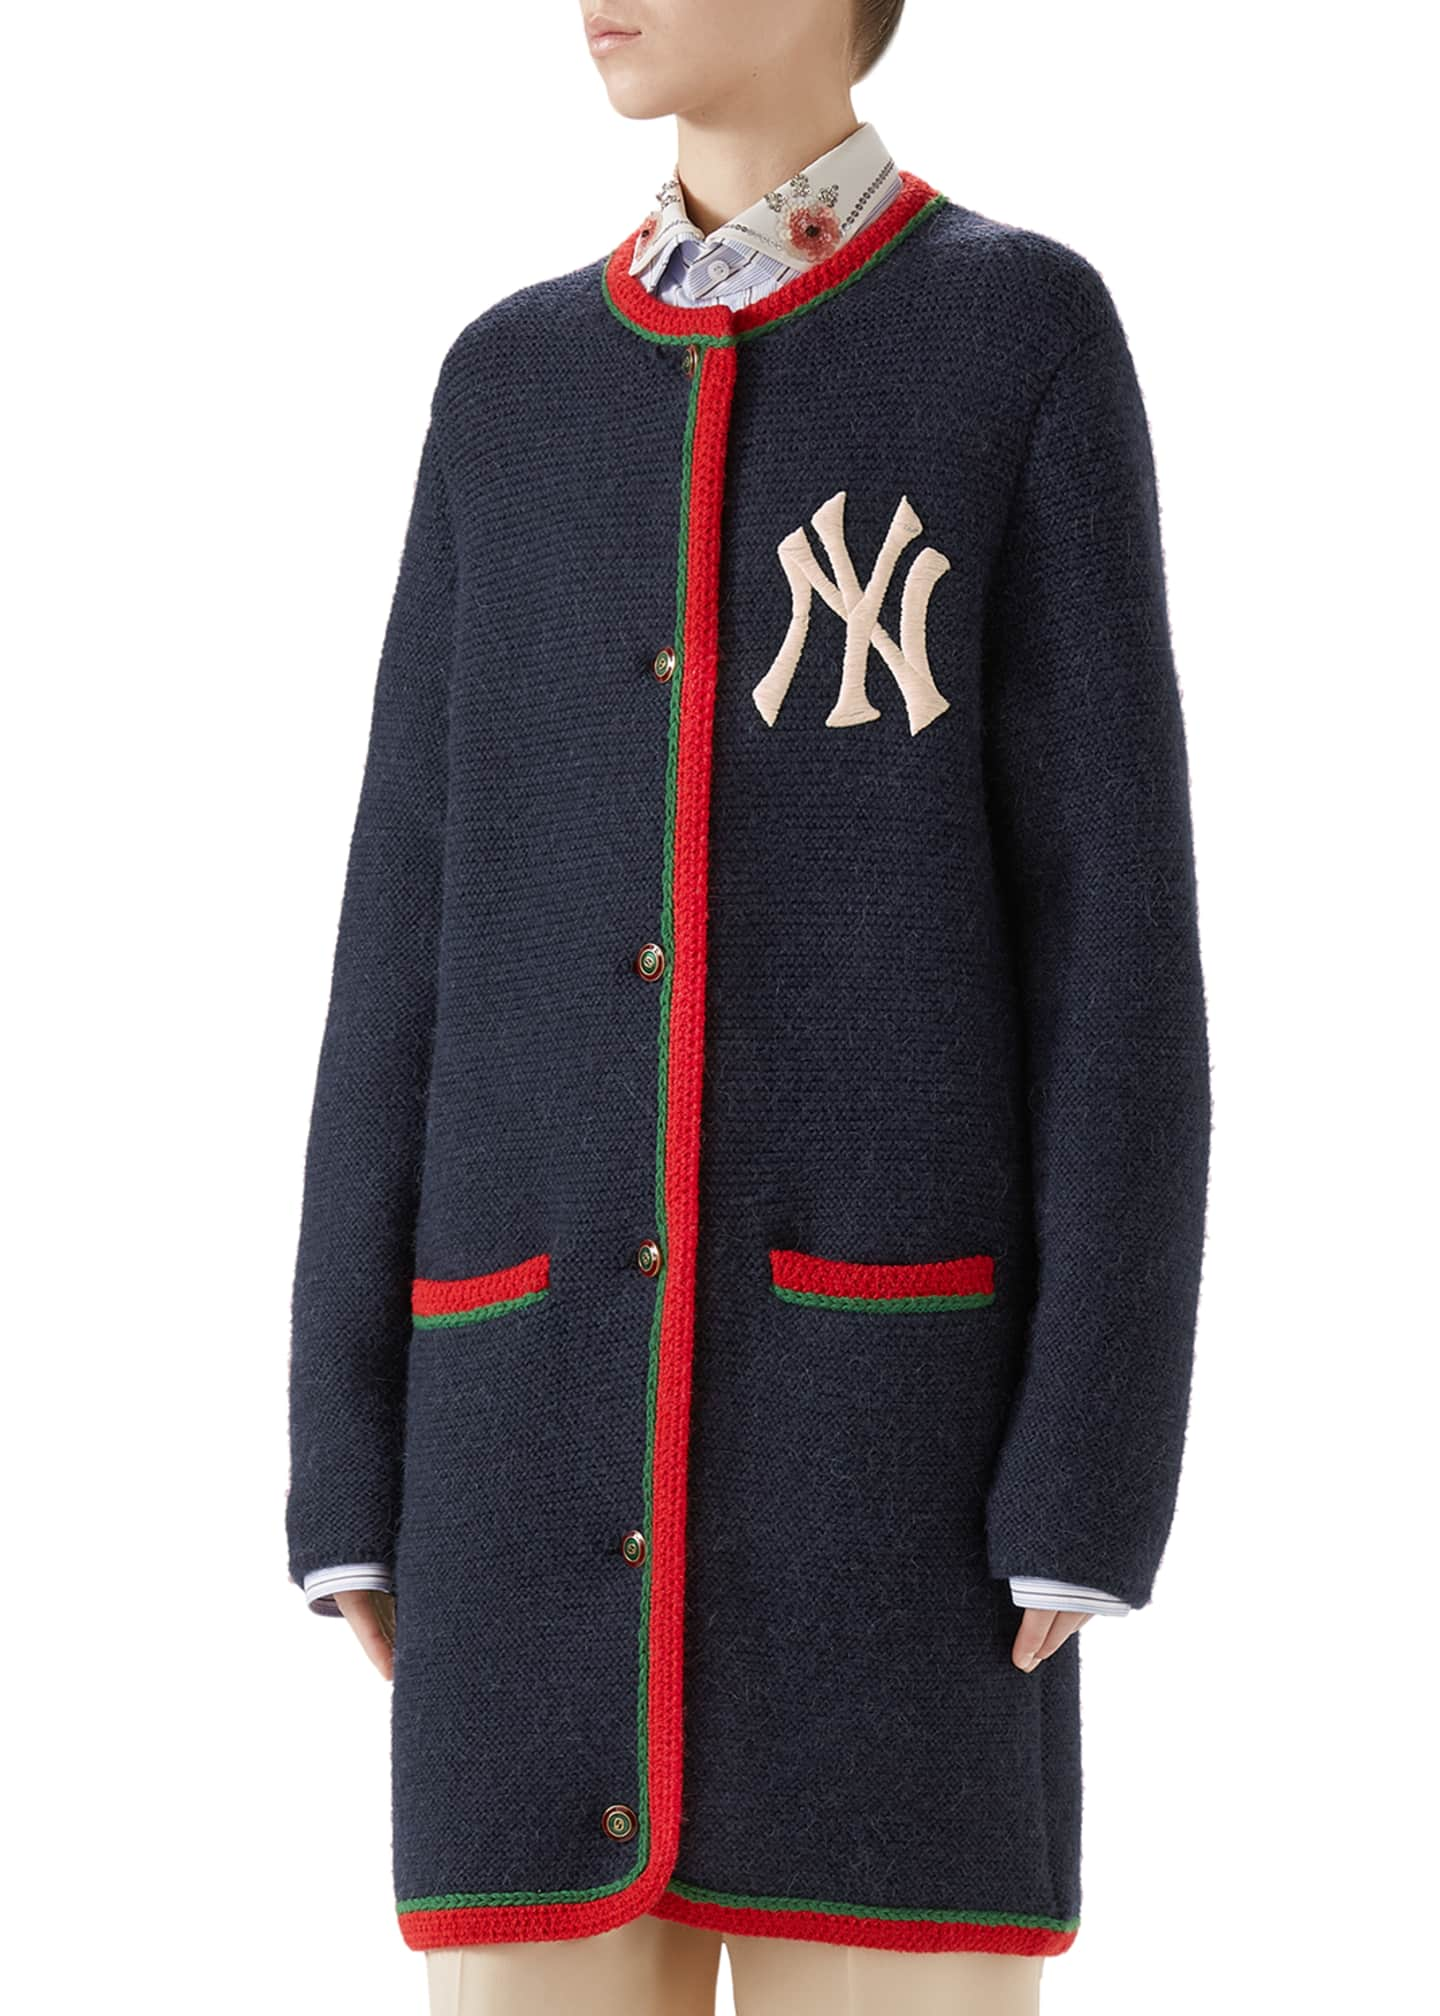 Gucci NY Yankees MLB Crewneck Cardigan w/ Back